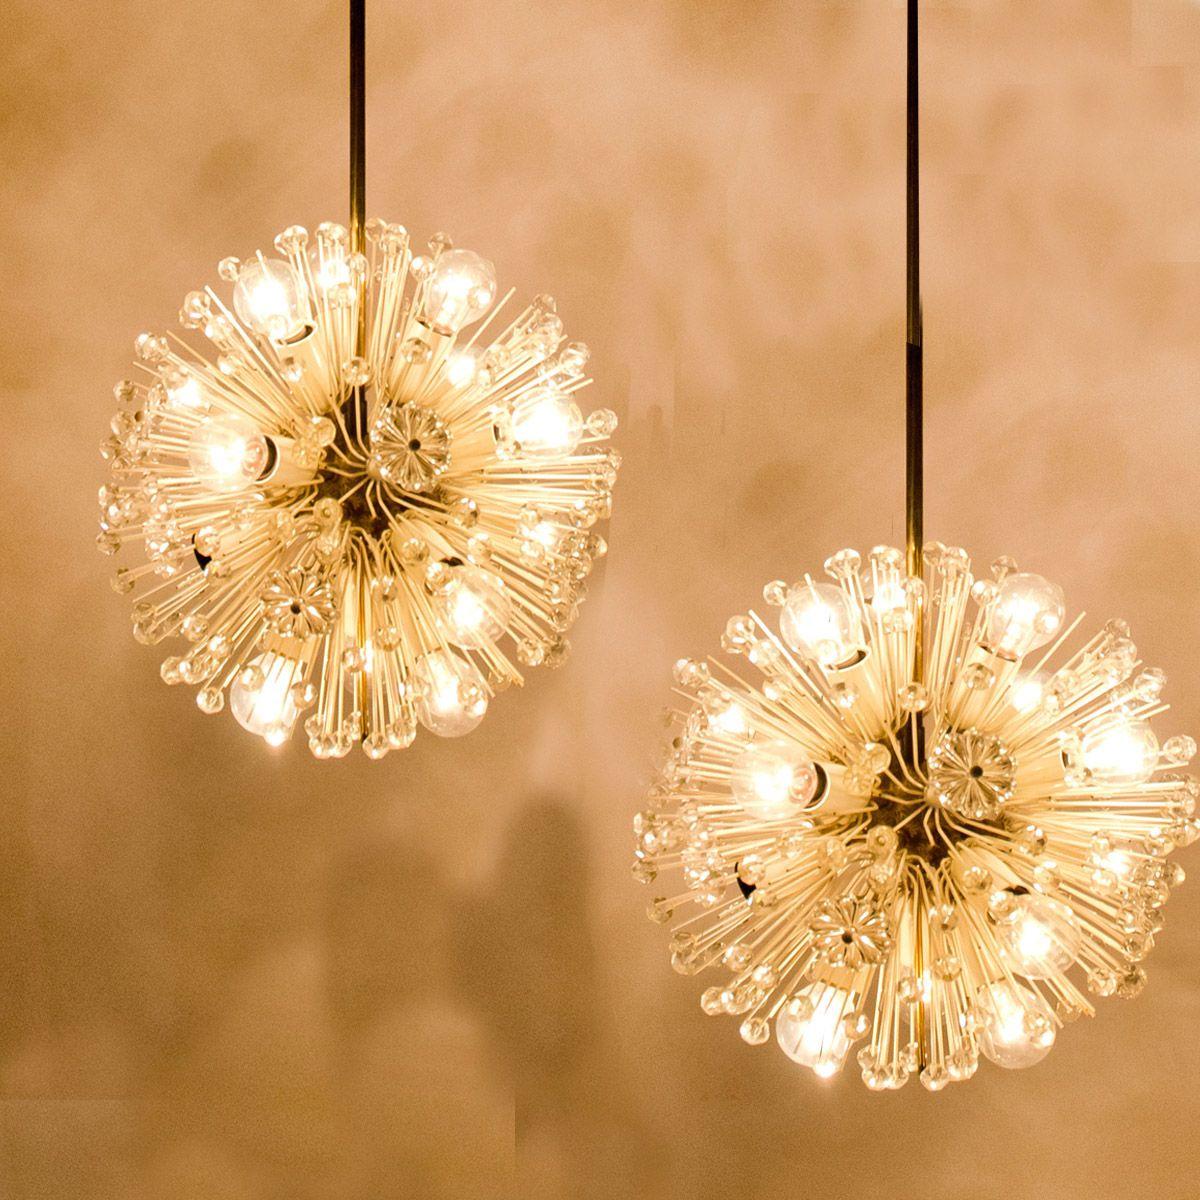 Sputnik christmas ornaments - Austrian Snowball Orbit Sputnik Ceiling Lights By Emil Stejnar For Rubert Nikoll 1950s Set Of 2